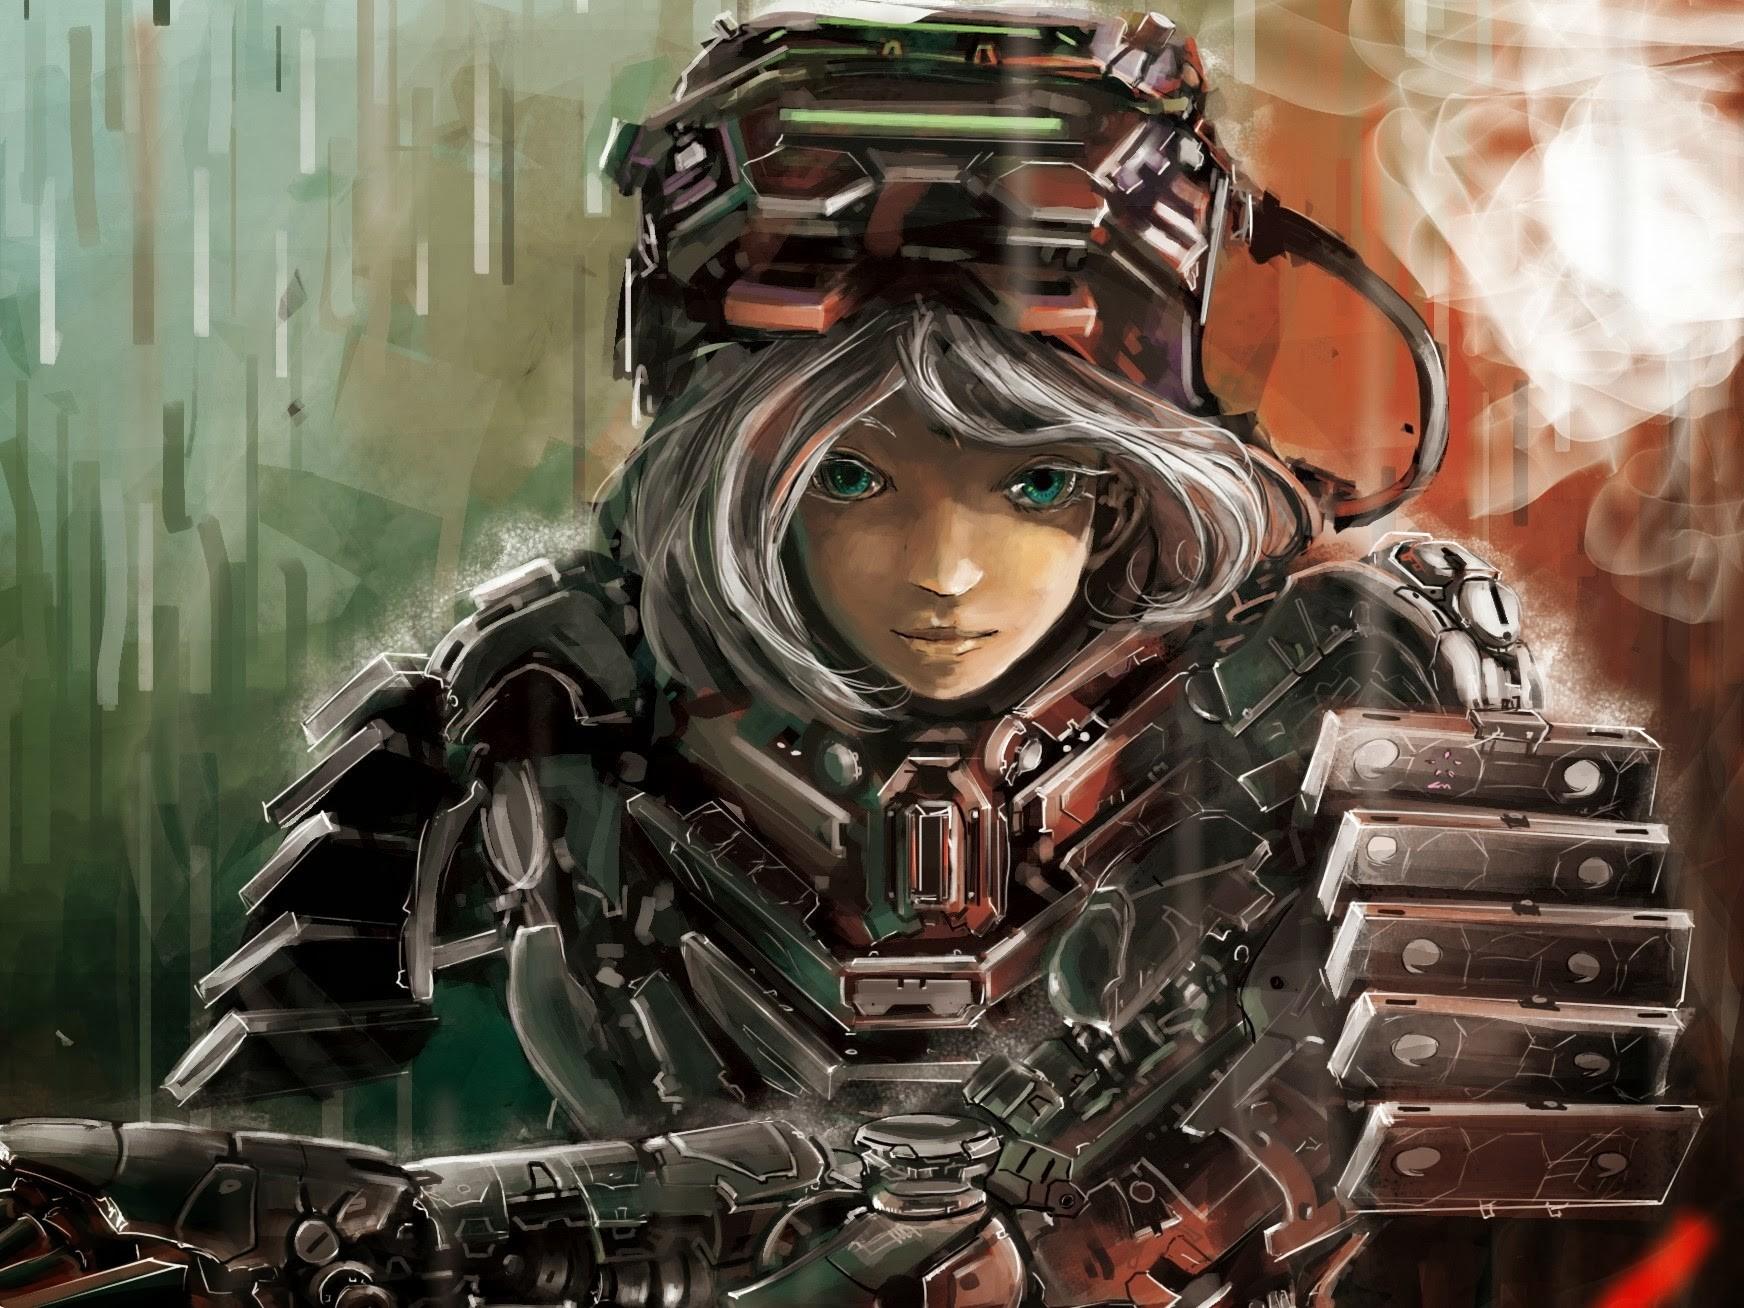 armor futuristic anime anime girls science fiction artwork